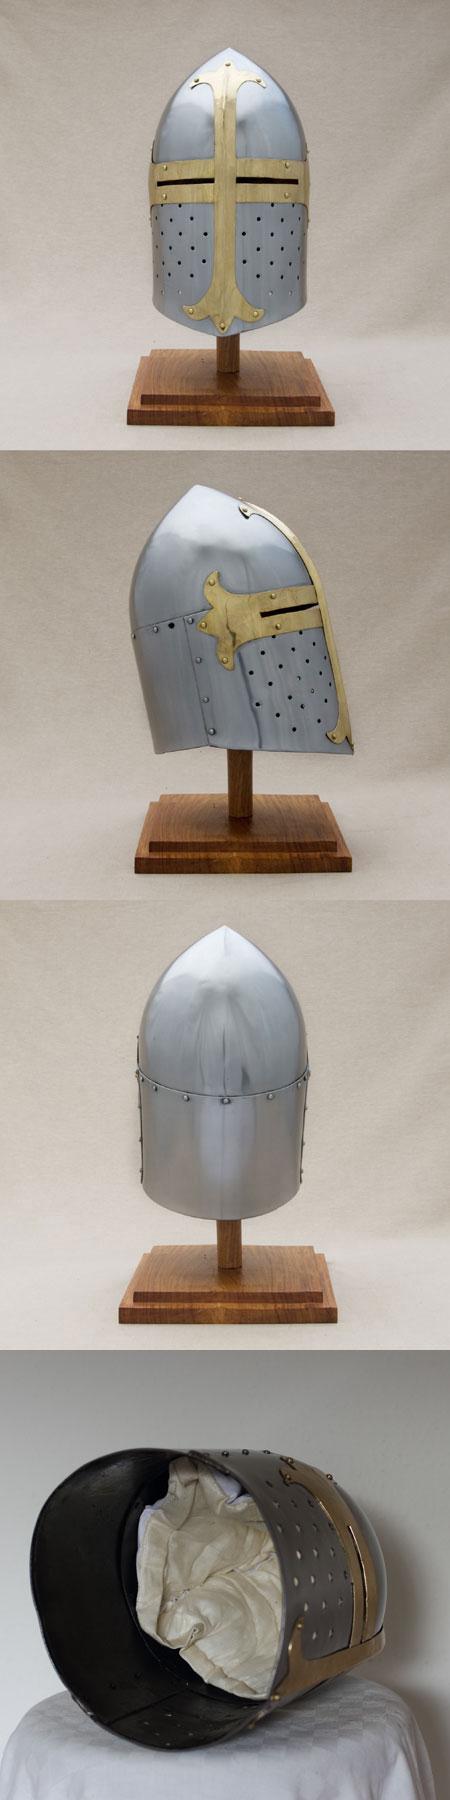 Kreuzfahrer großer Helm Zuckerhut-Form